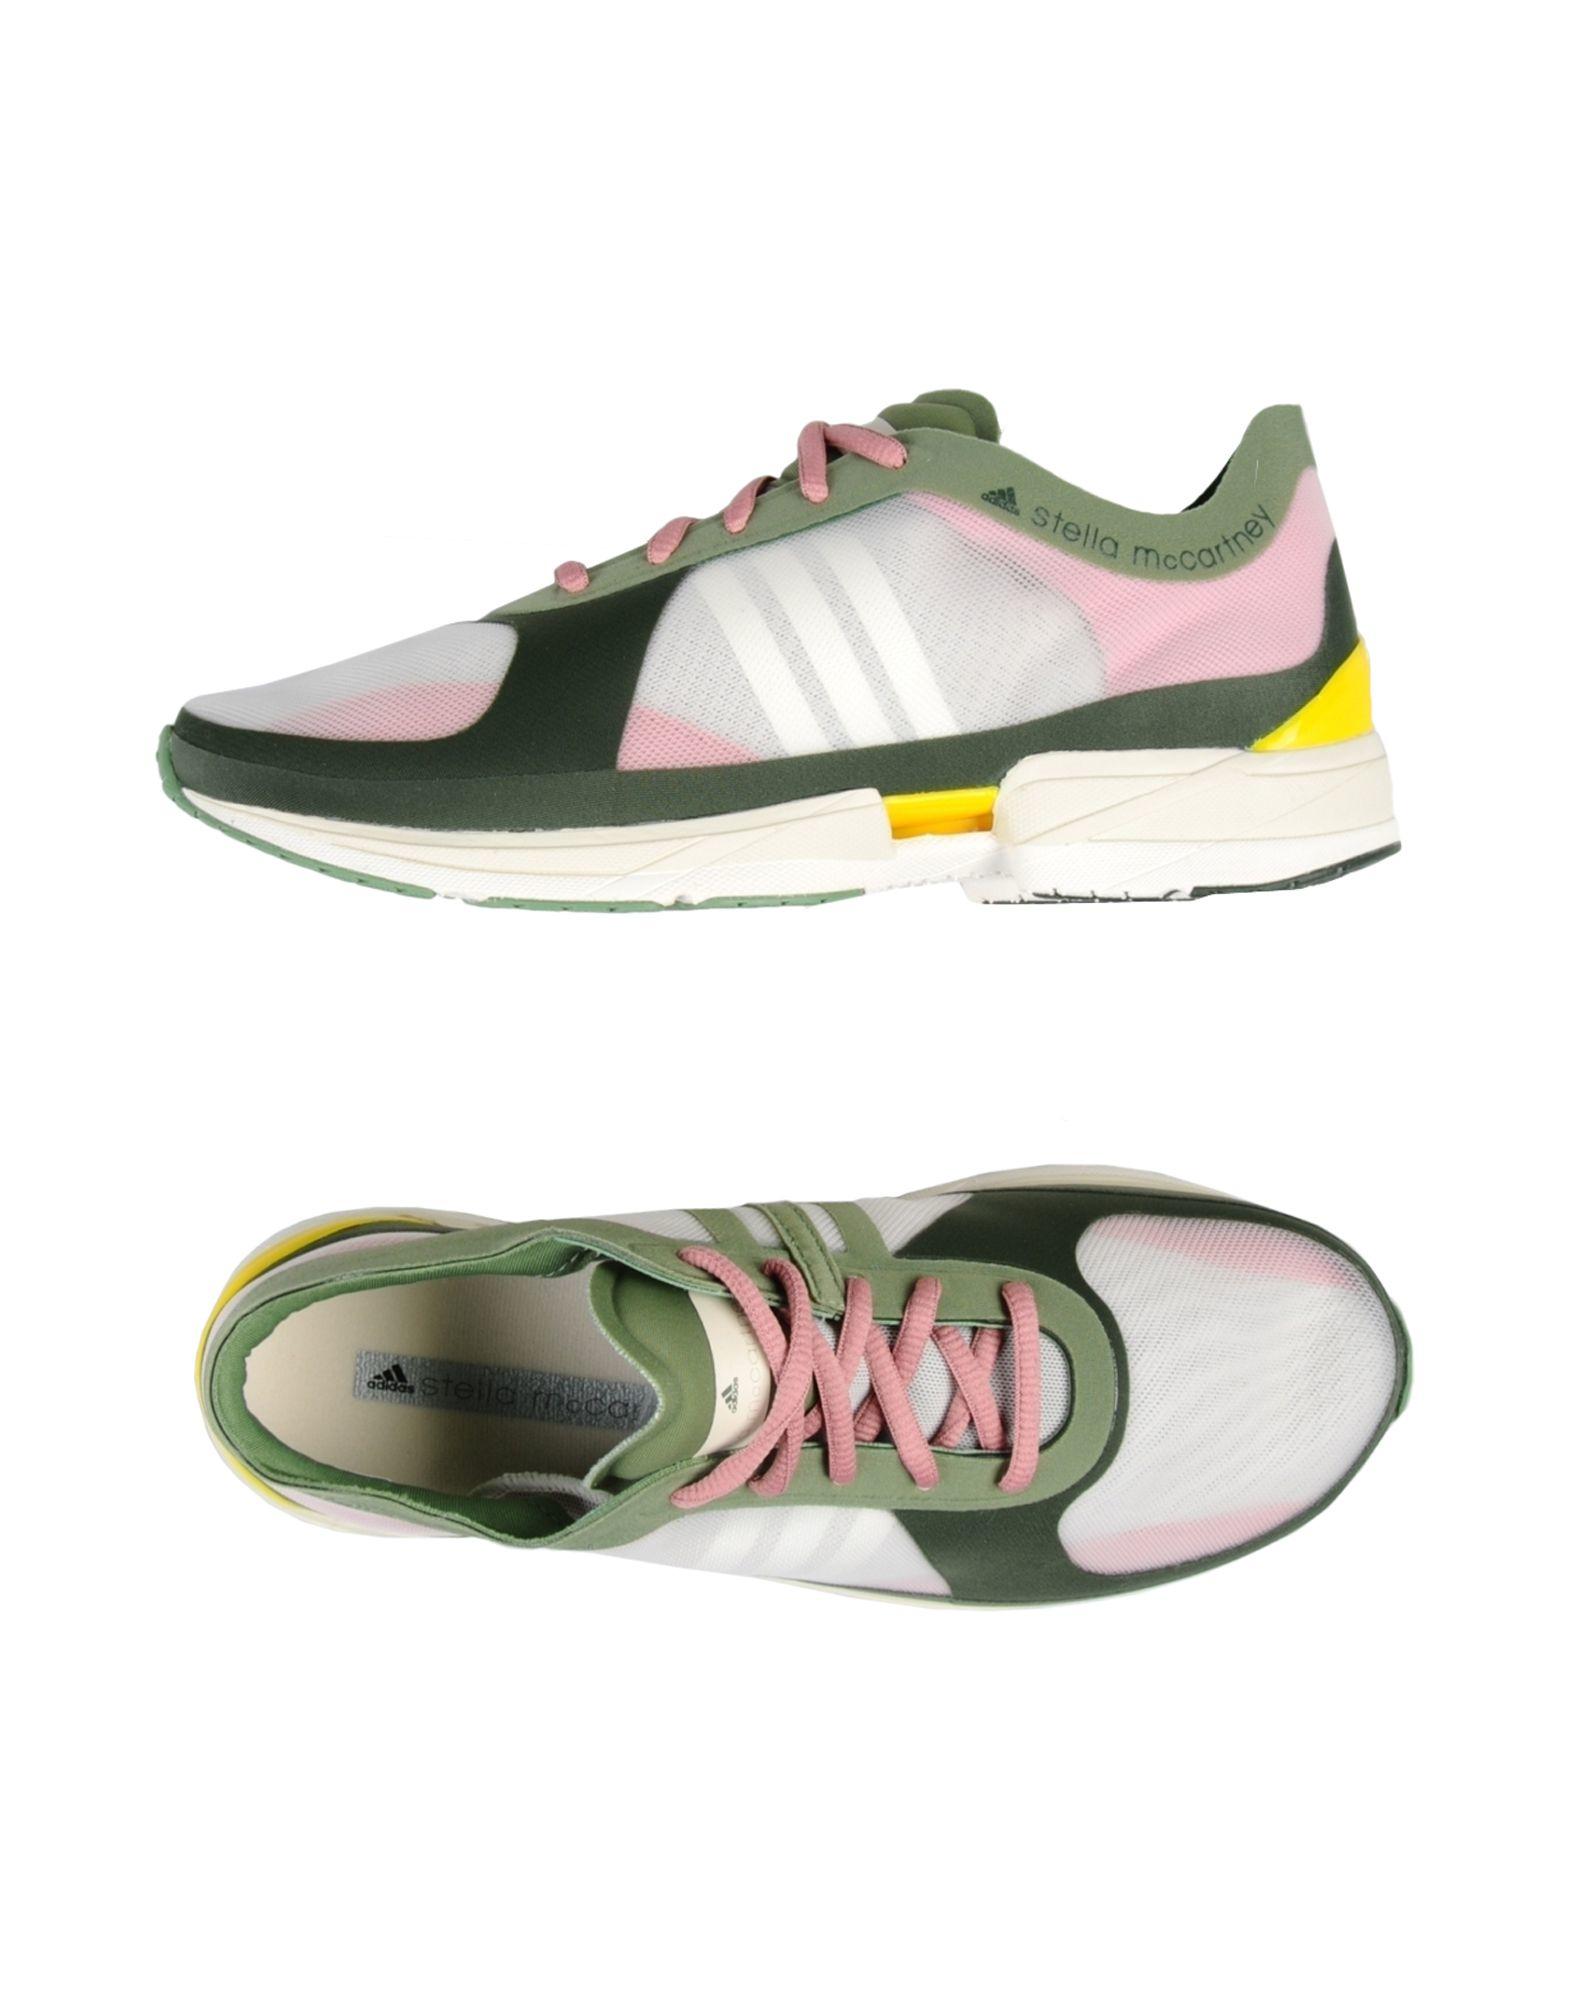 Stella Mccartney Shoes Sale